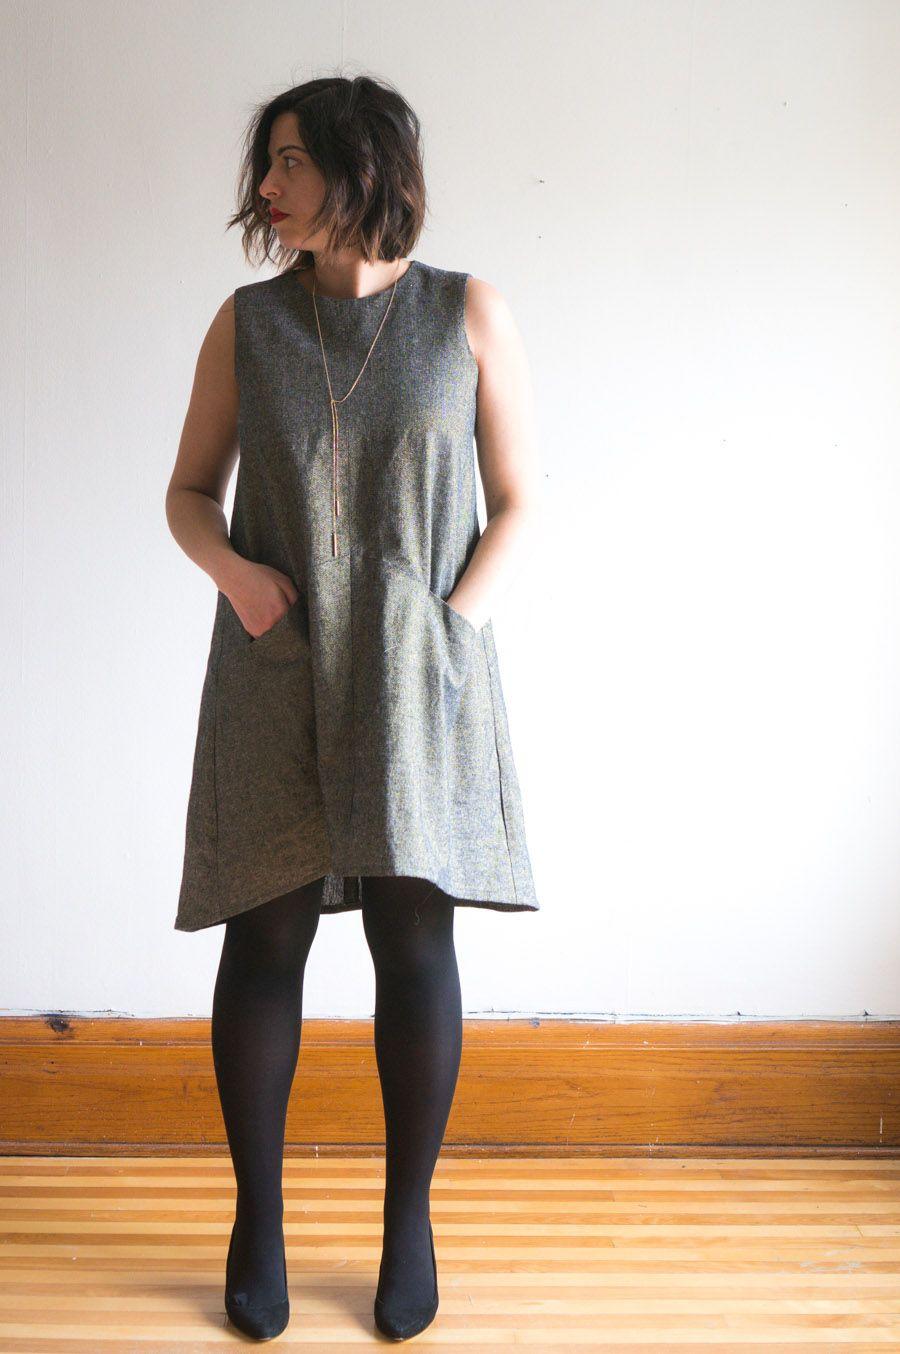 44f134f1acd Farrow Dress by Grainline Studio    Kaufman Essex Metallic Linen    Handmade  by Closet Case Patterns